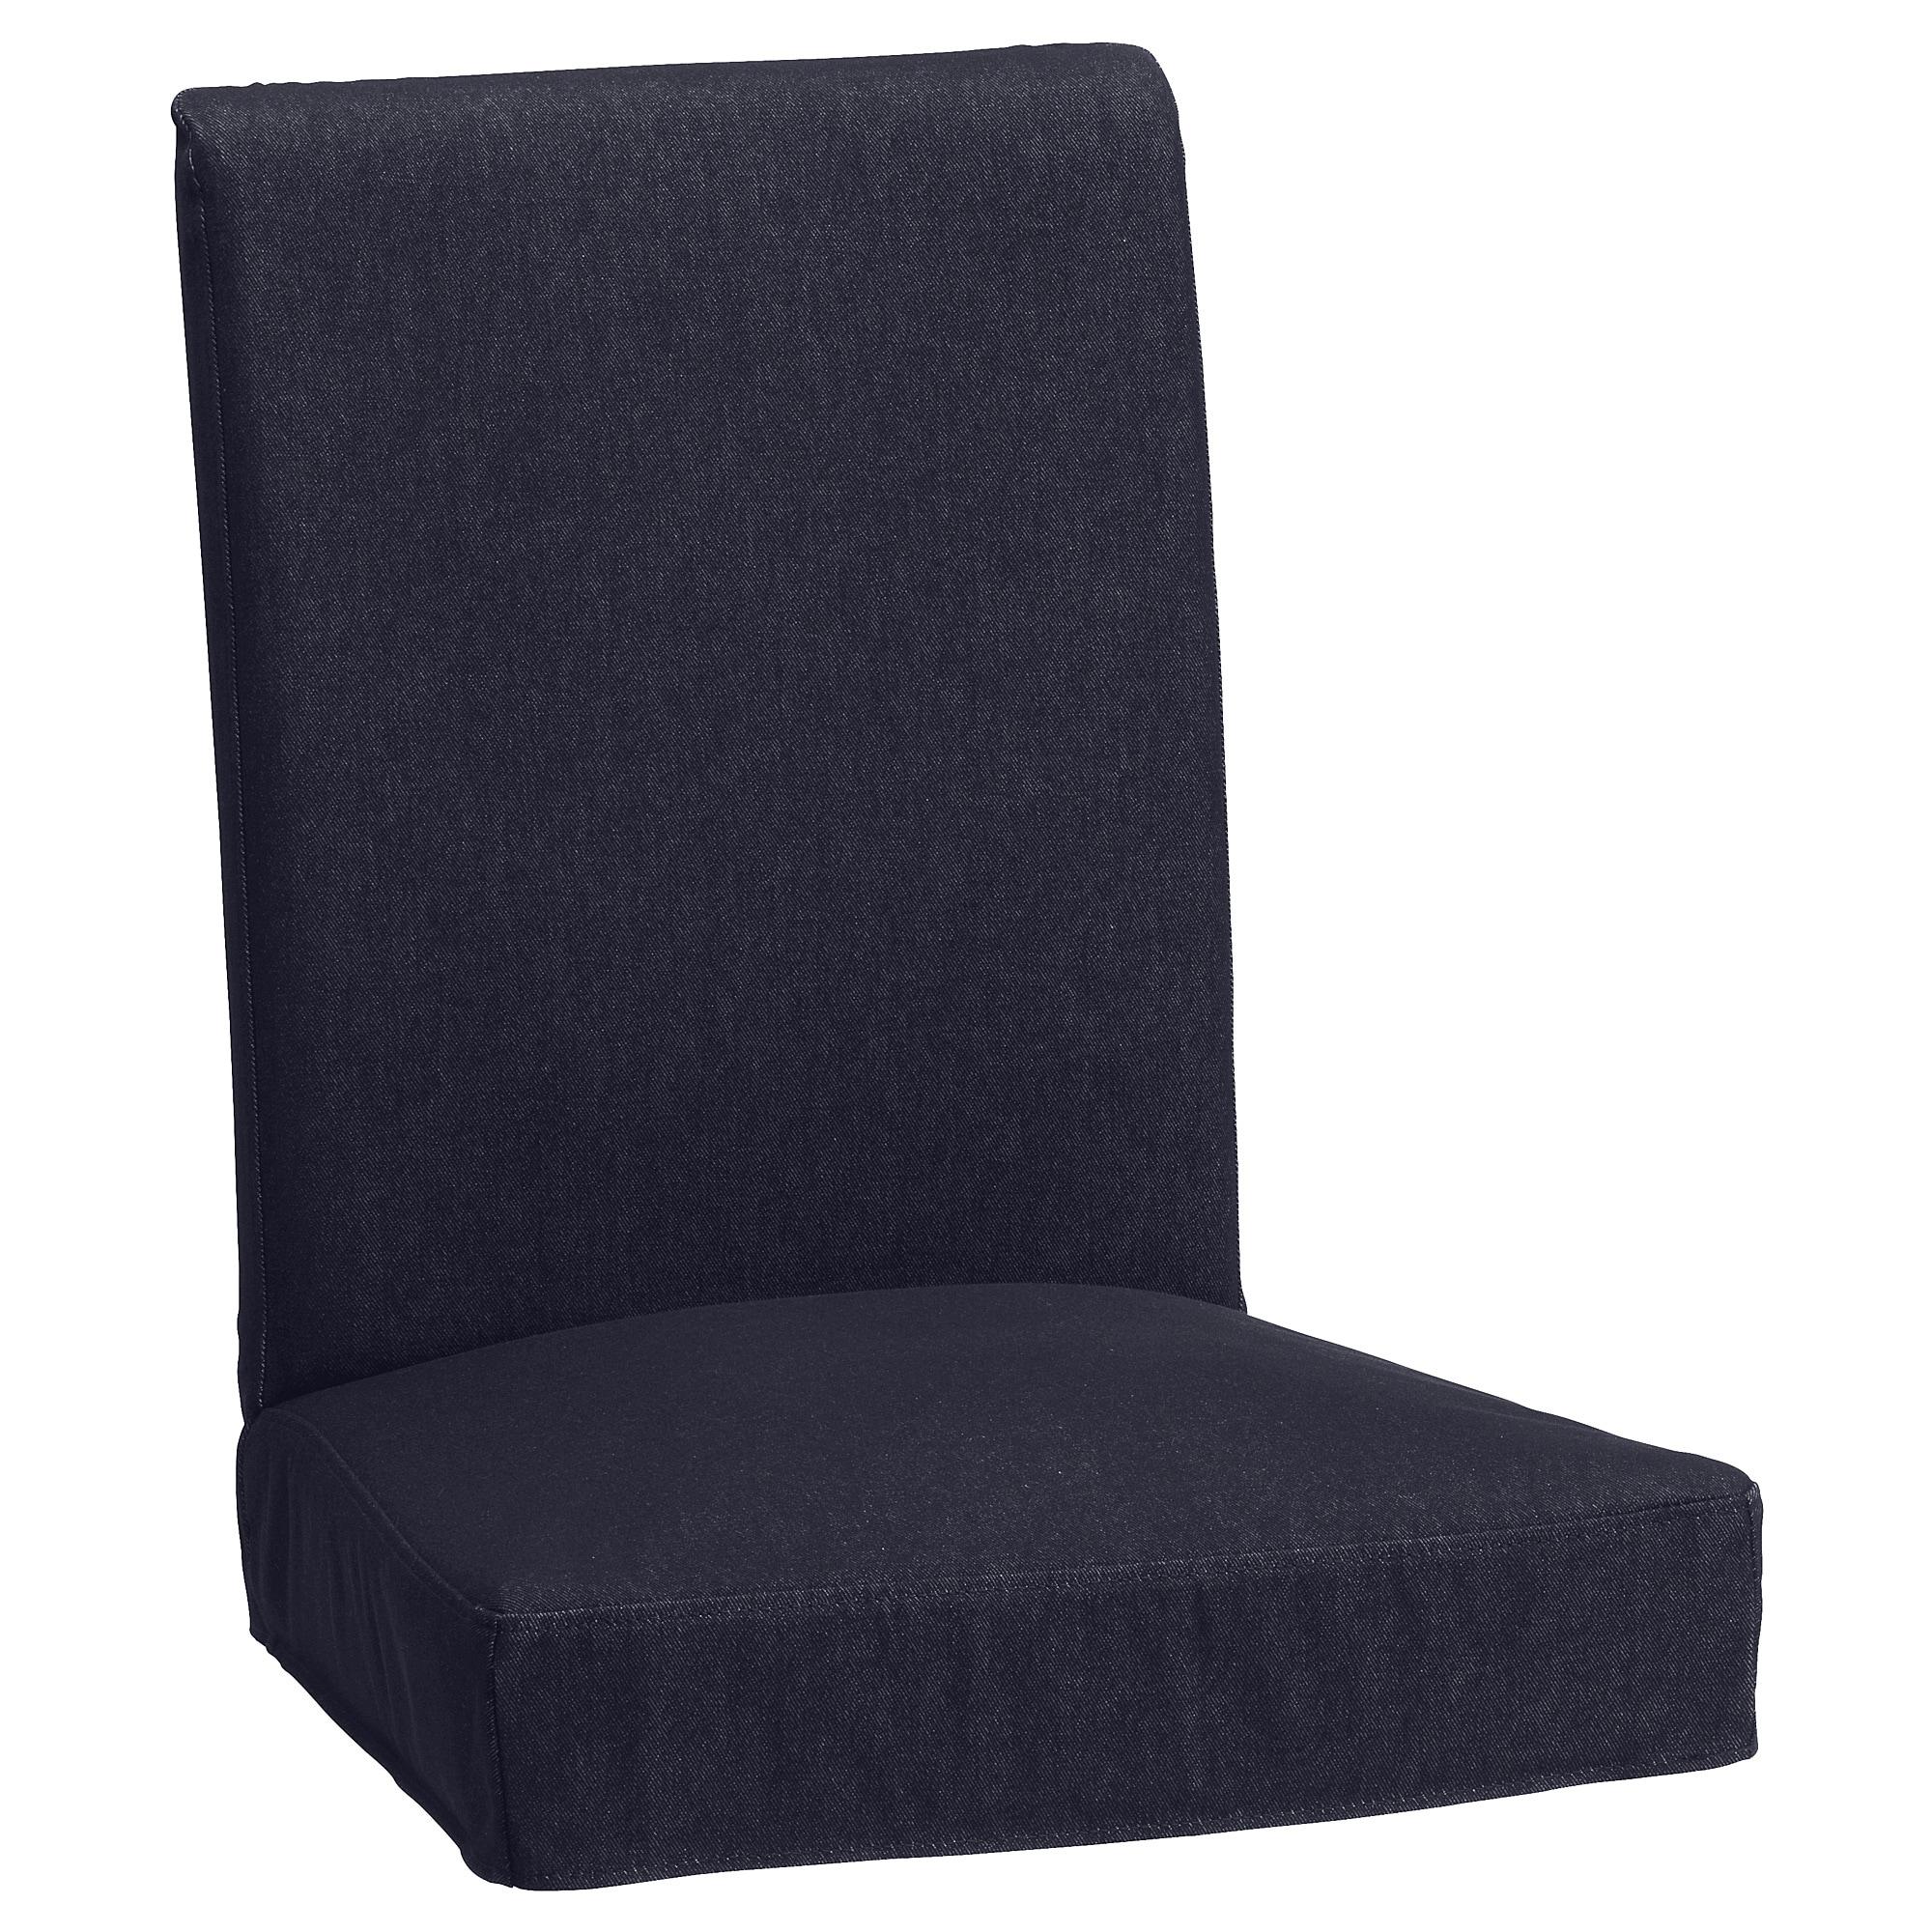 Fundas Sillas Comedor Zara Home X8d1 Ikea Fundas Sillas Fabulous Finest El Elegante Fundas Sillas